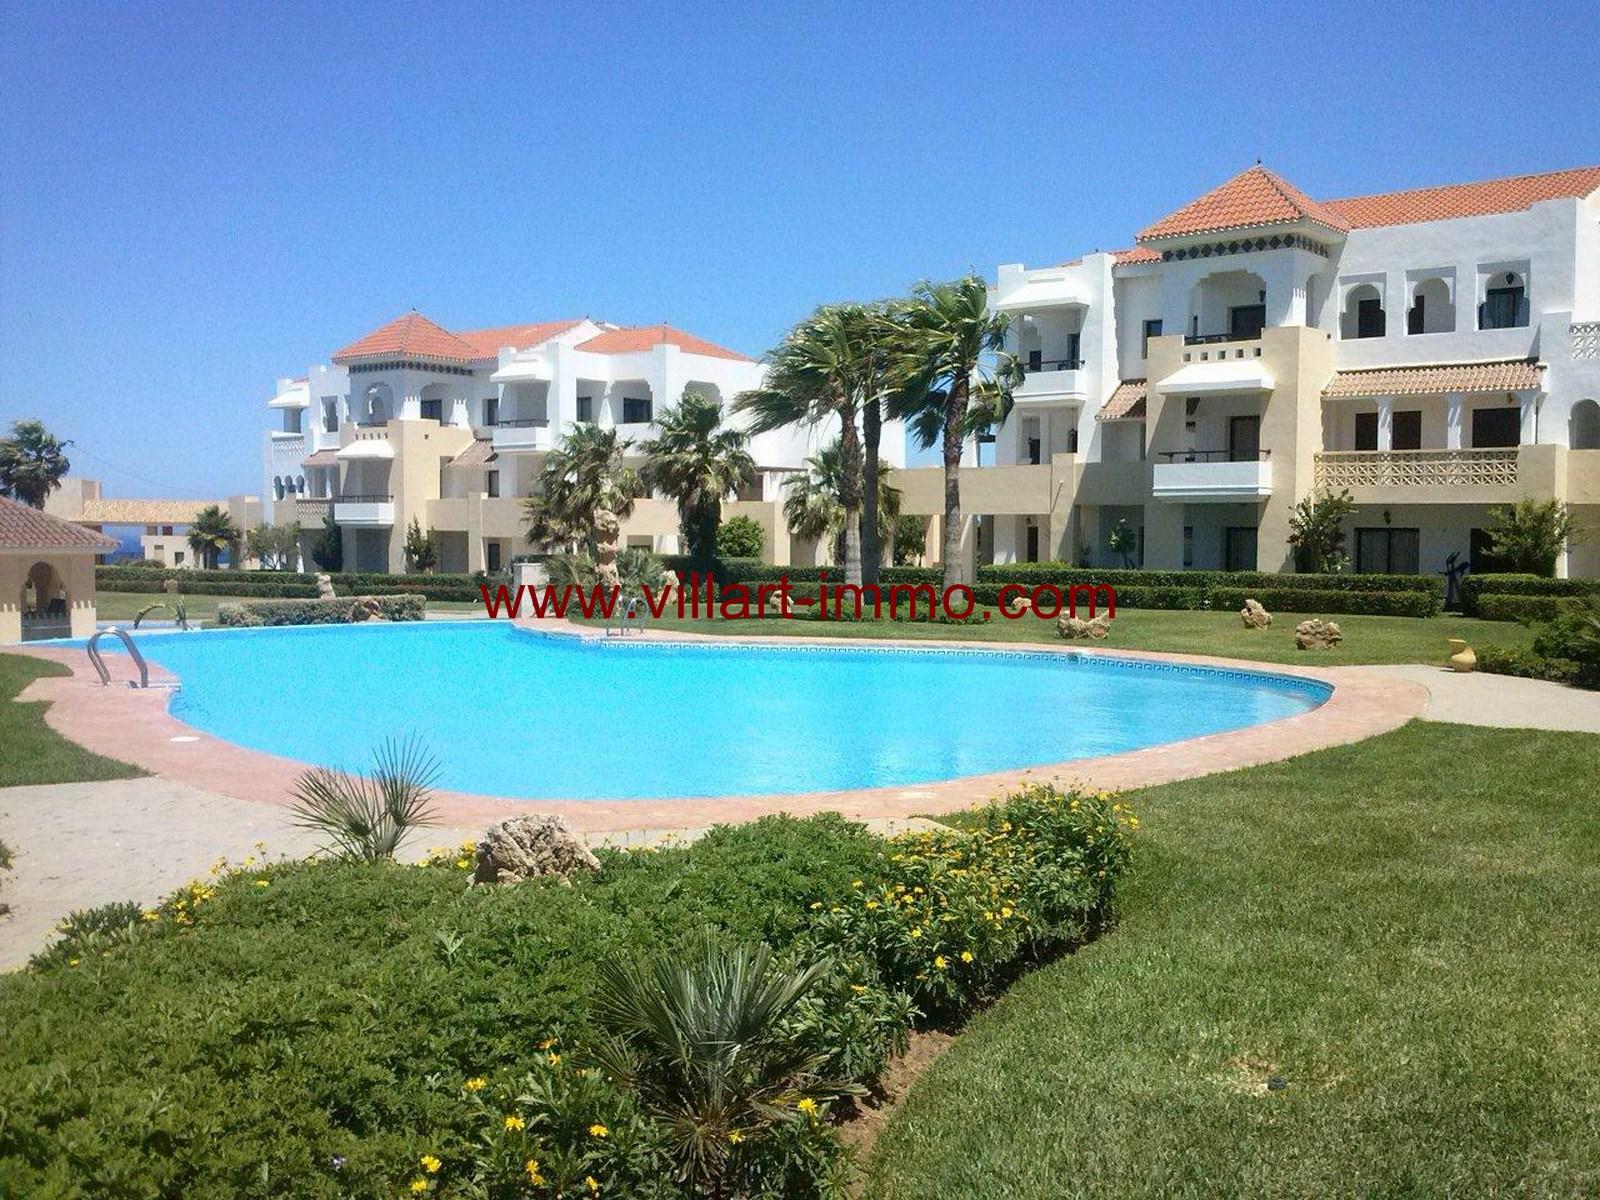 Appartement vendre dans r sidence avec piscines for Appartement piscine